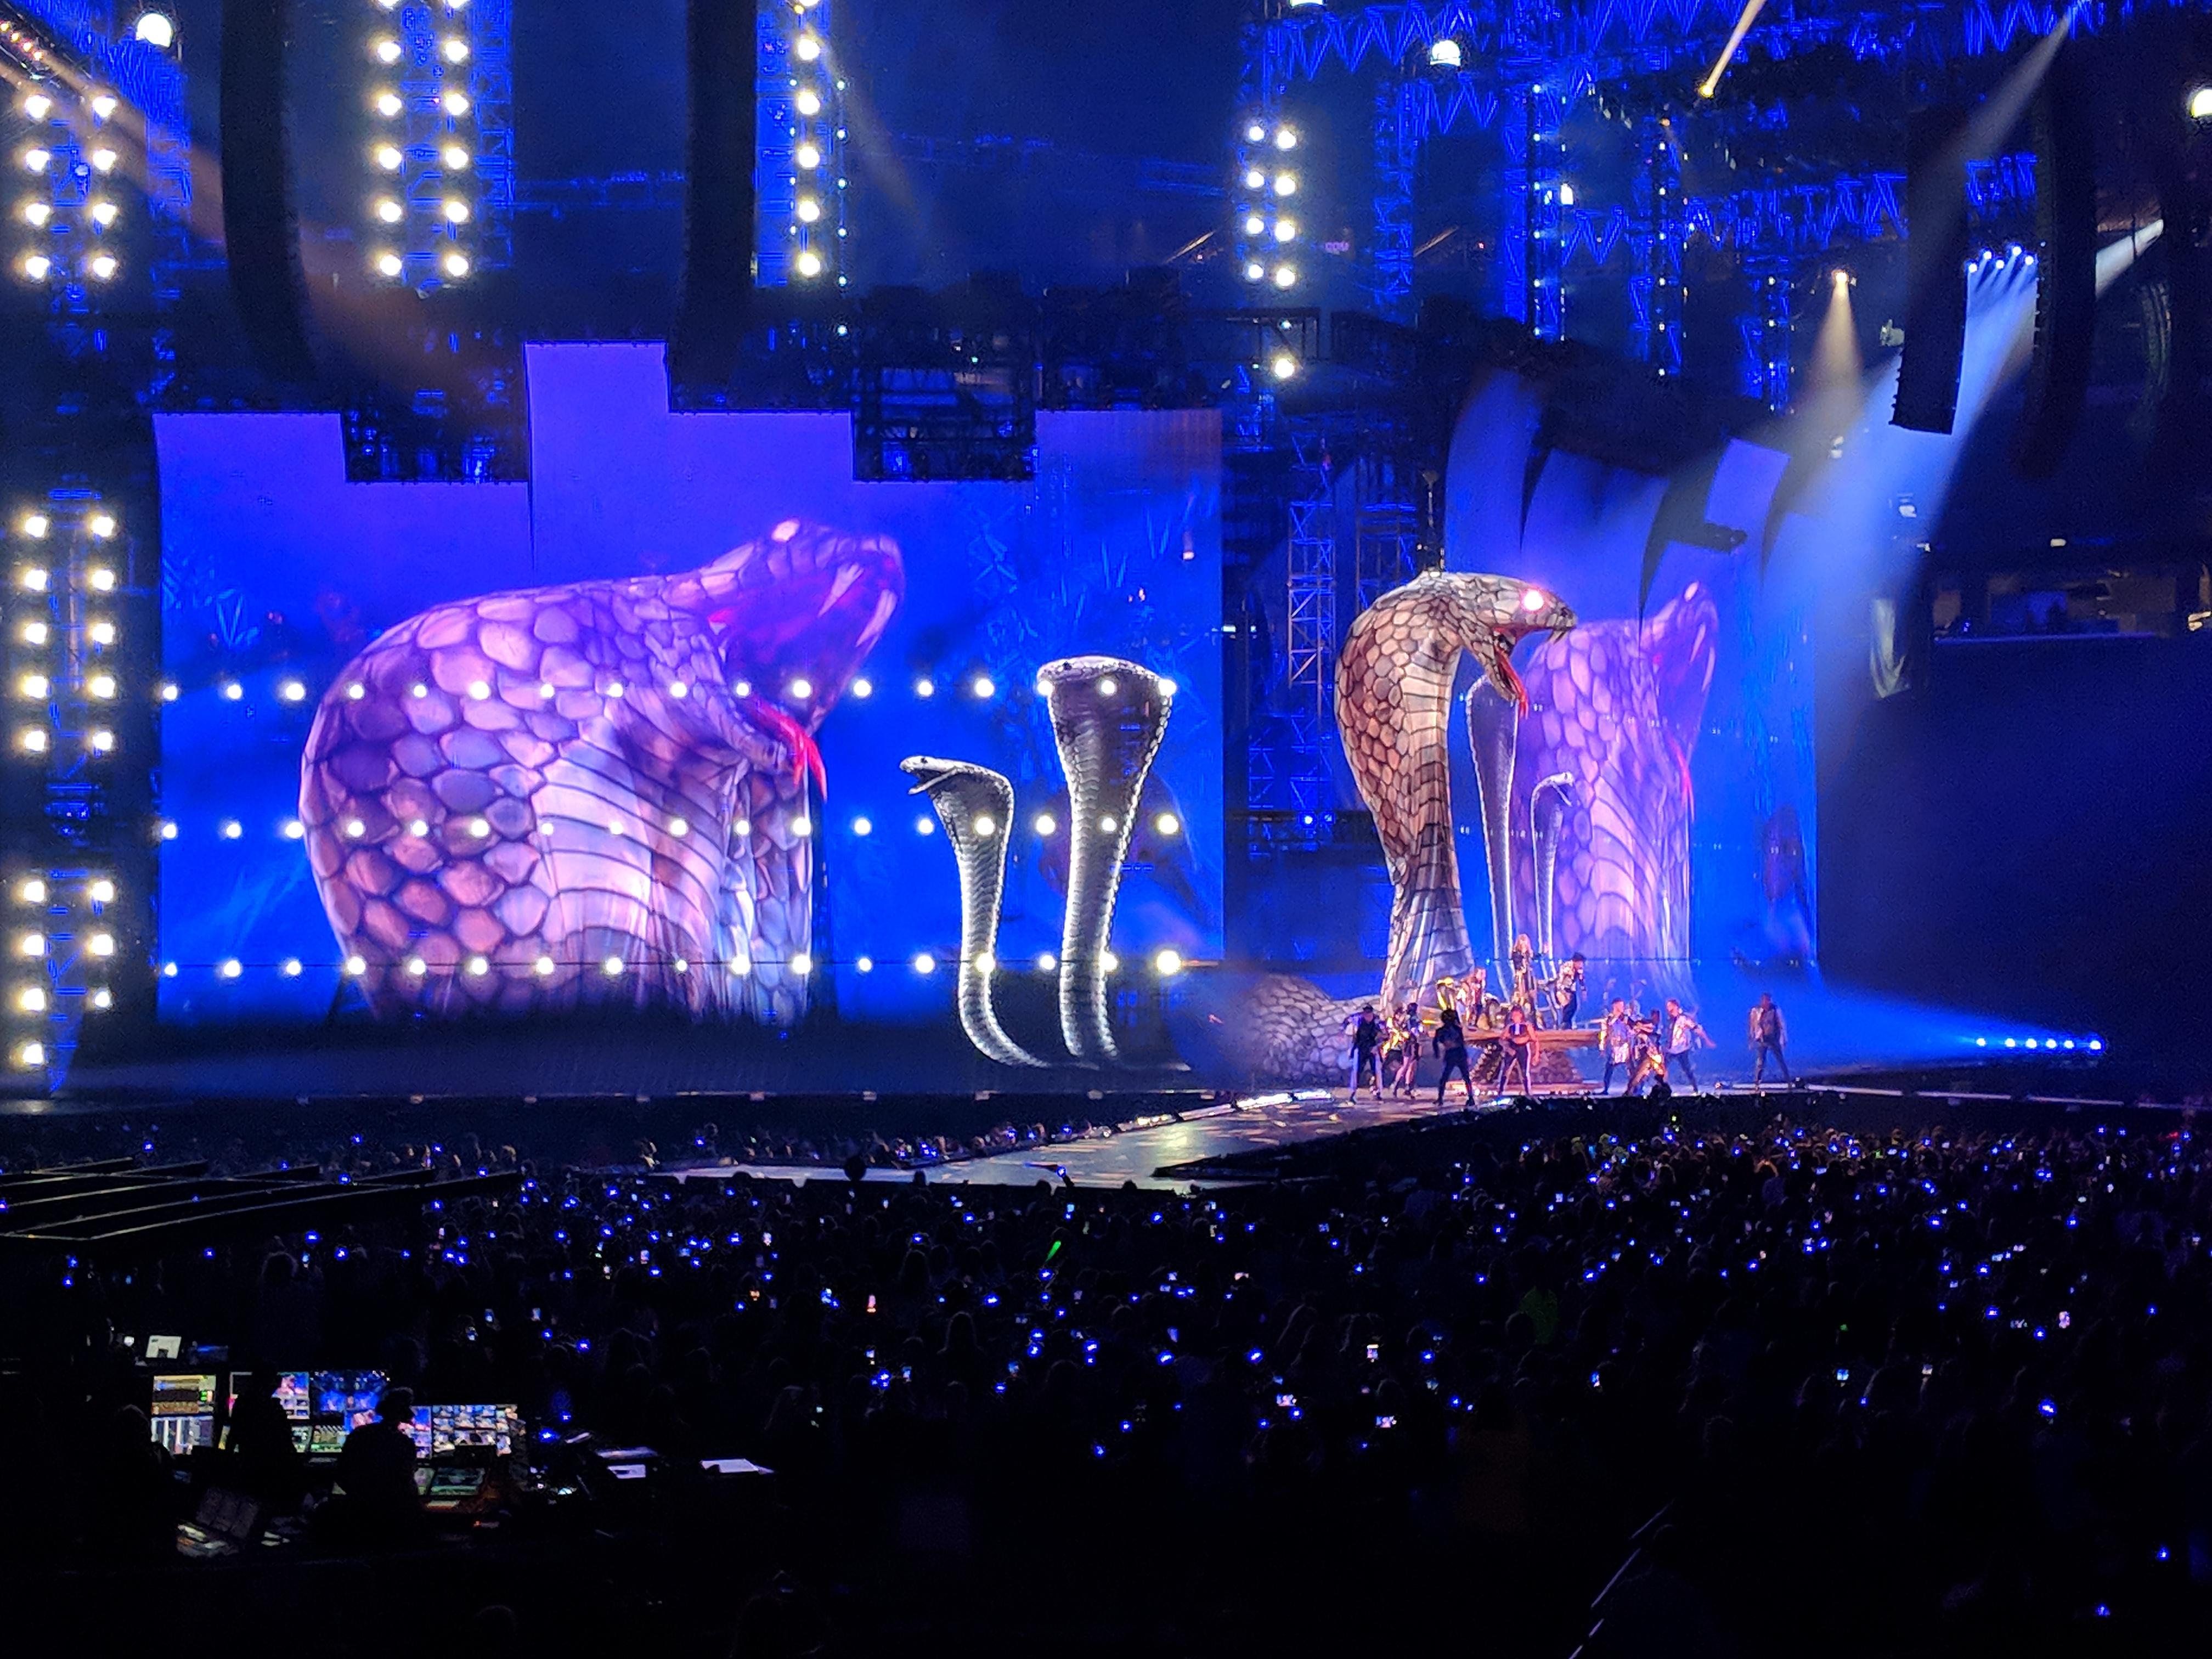 Taylor_Swift_Reputation_Tour_Minneapolis_(42589262590).jpg